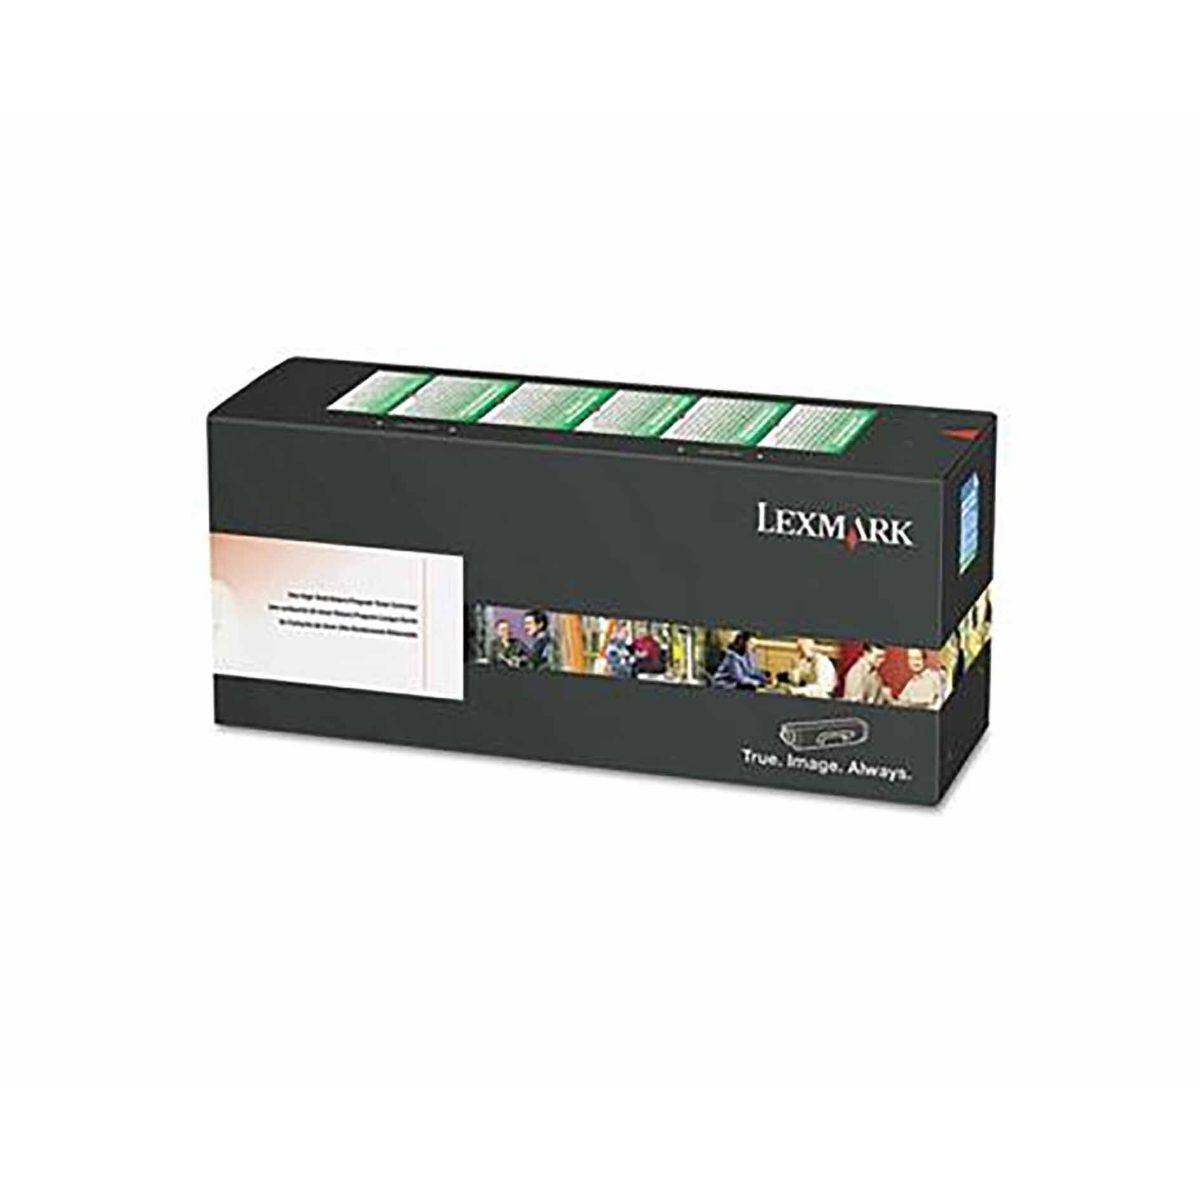 Lexmark 72K2XK0 Extra High Yield Black Original Toner Cartridge